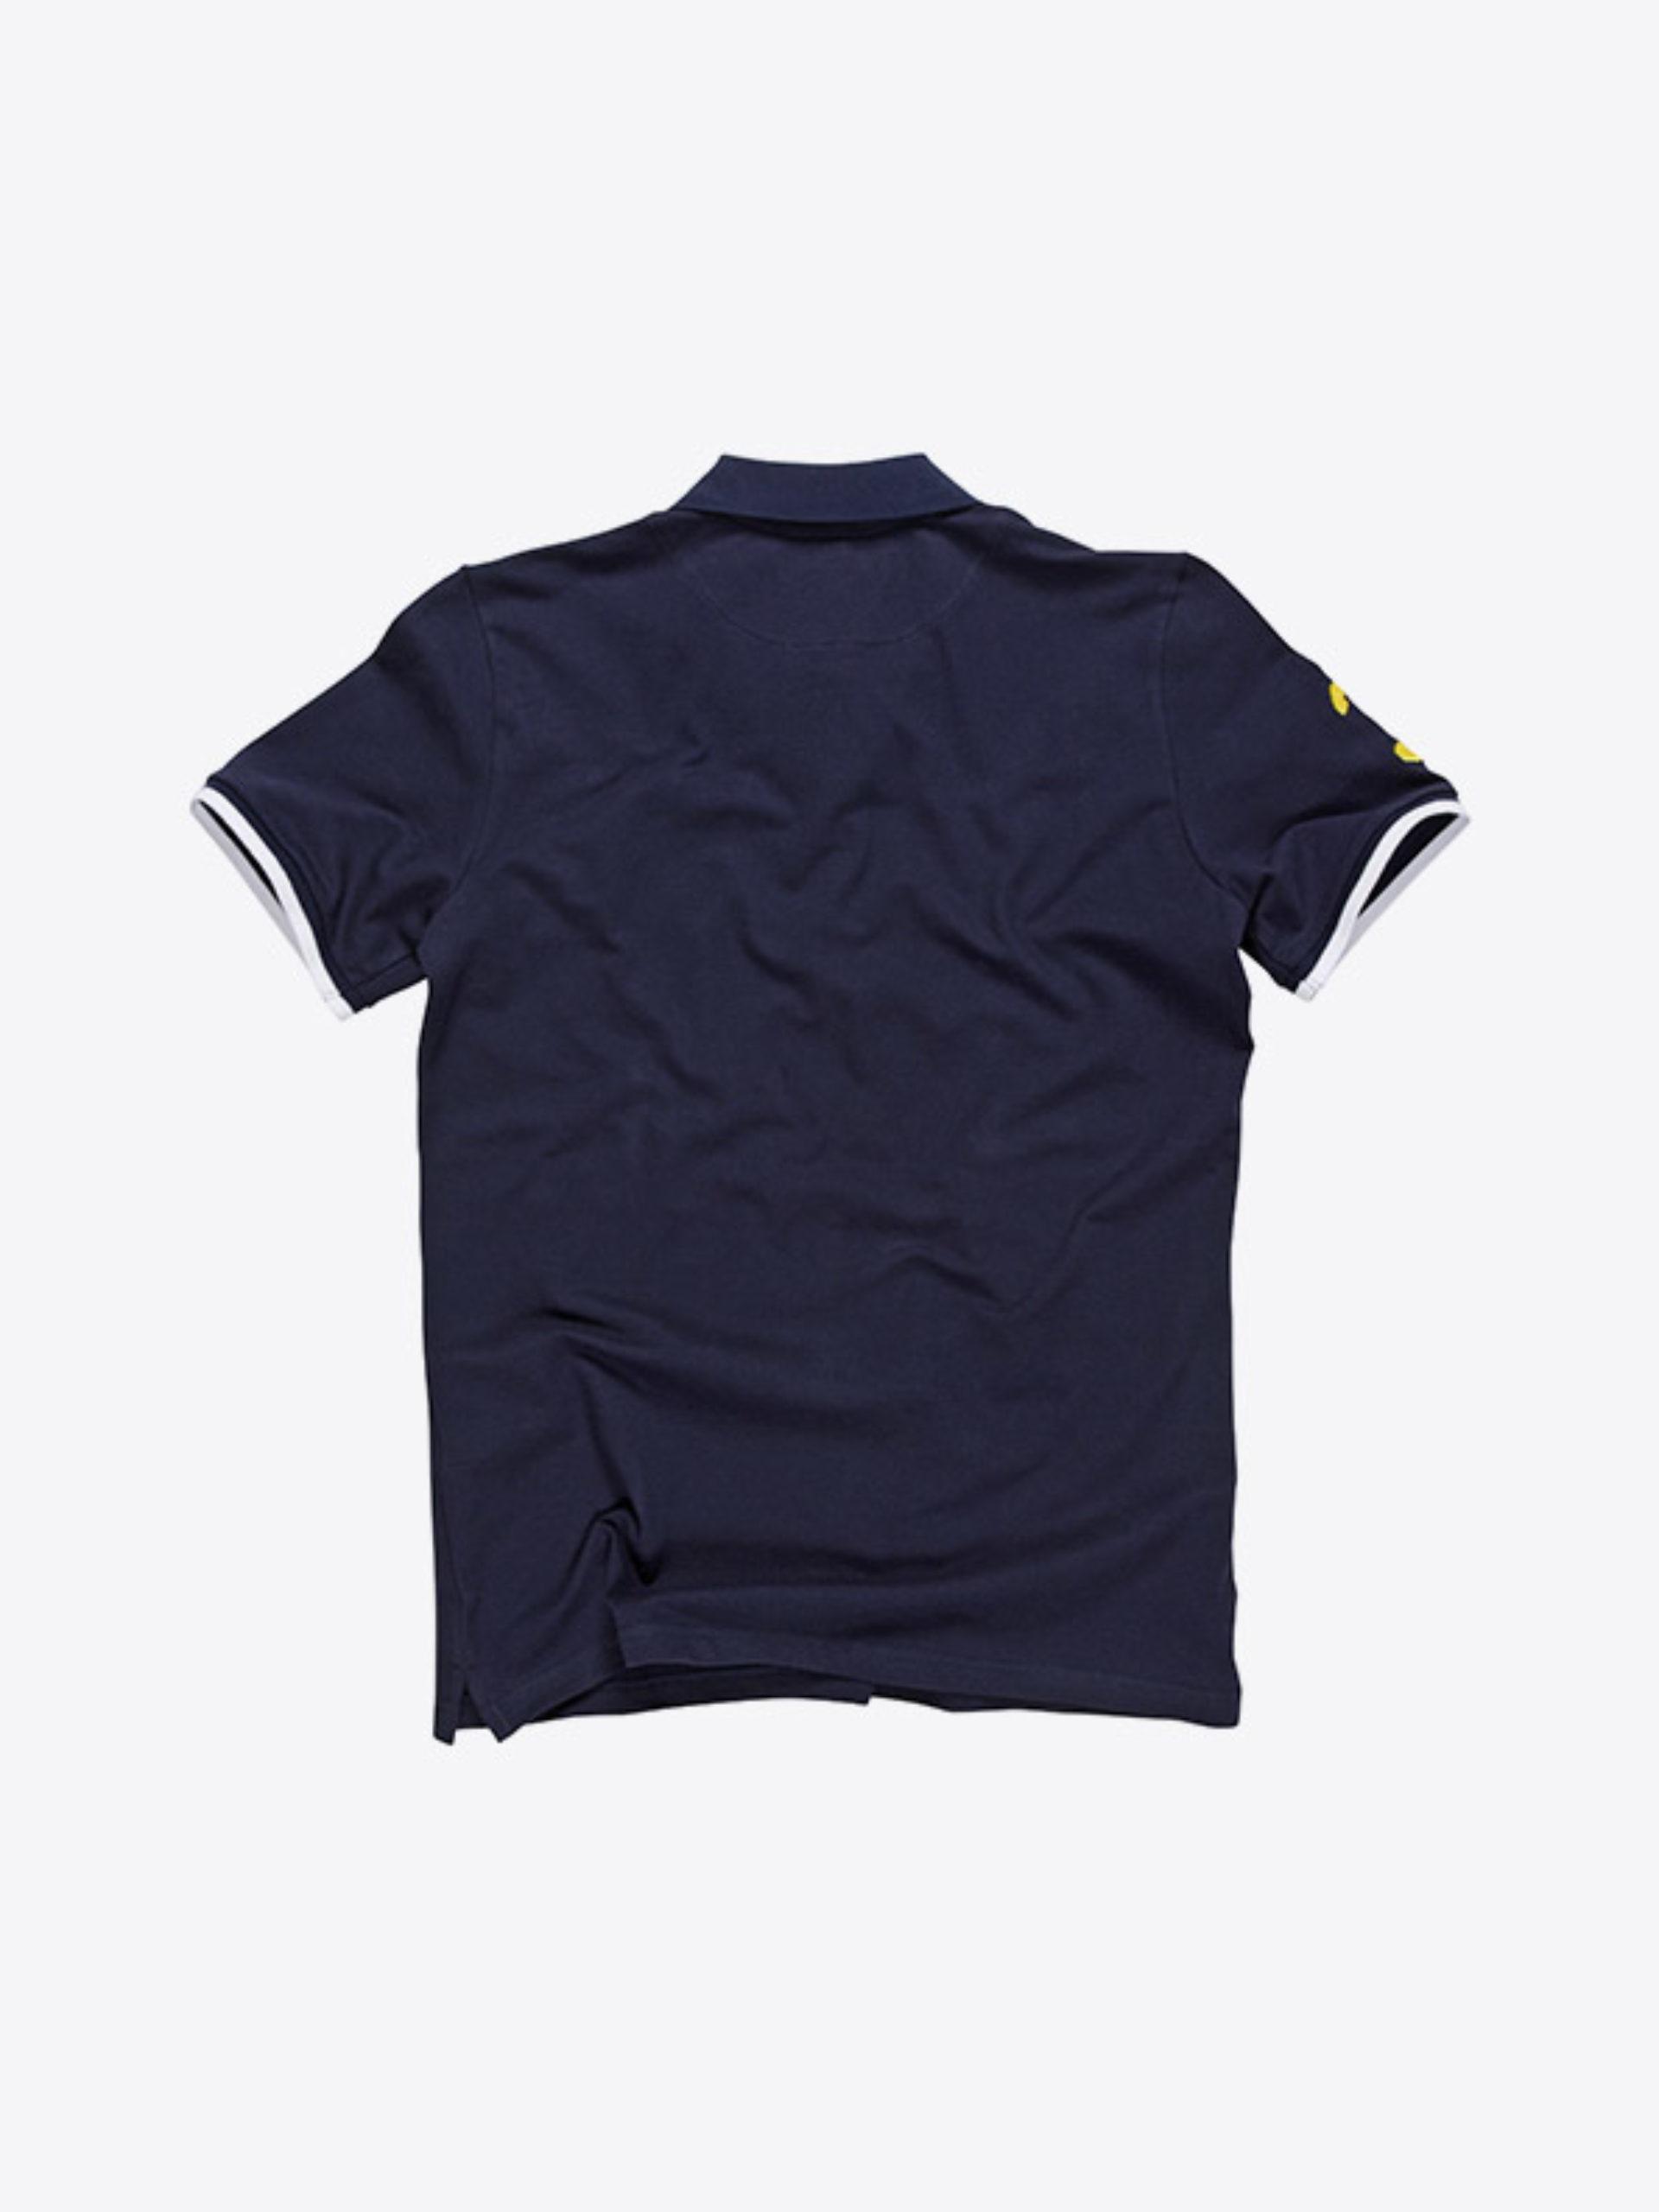 Herren Polo Kurzarm Shirt Besticken